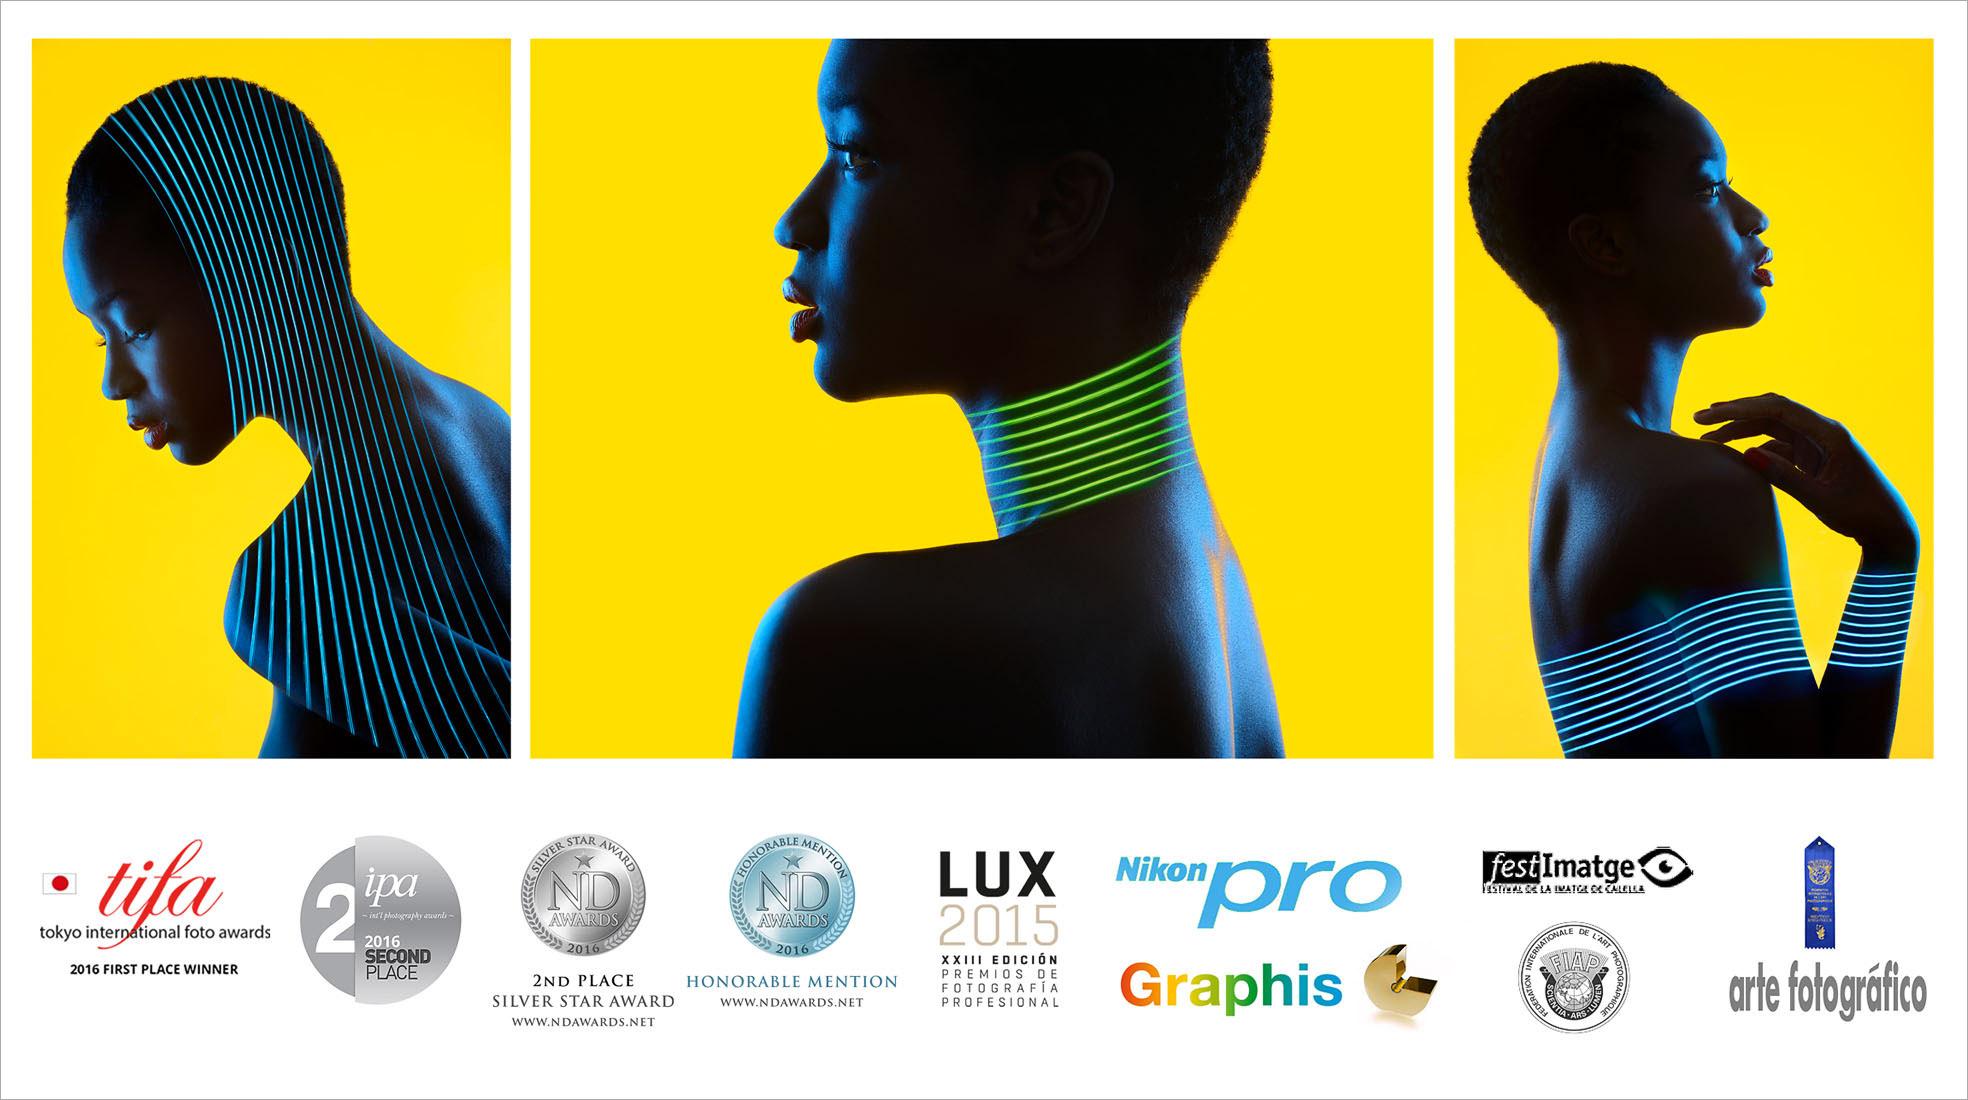 Lighting Clothes_ramonvaquero_premios_publicaciones_fotografos_vigo_españa_galicia